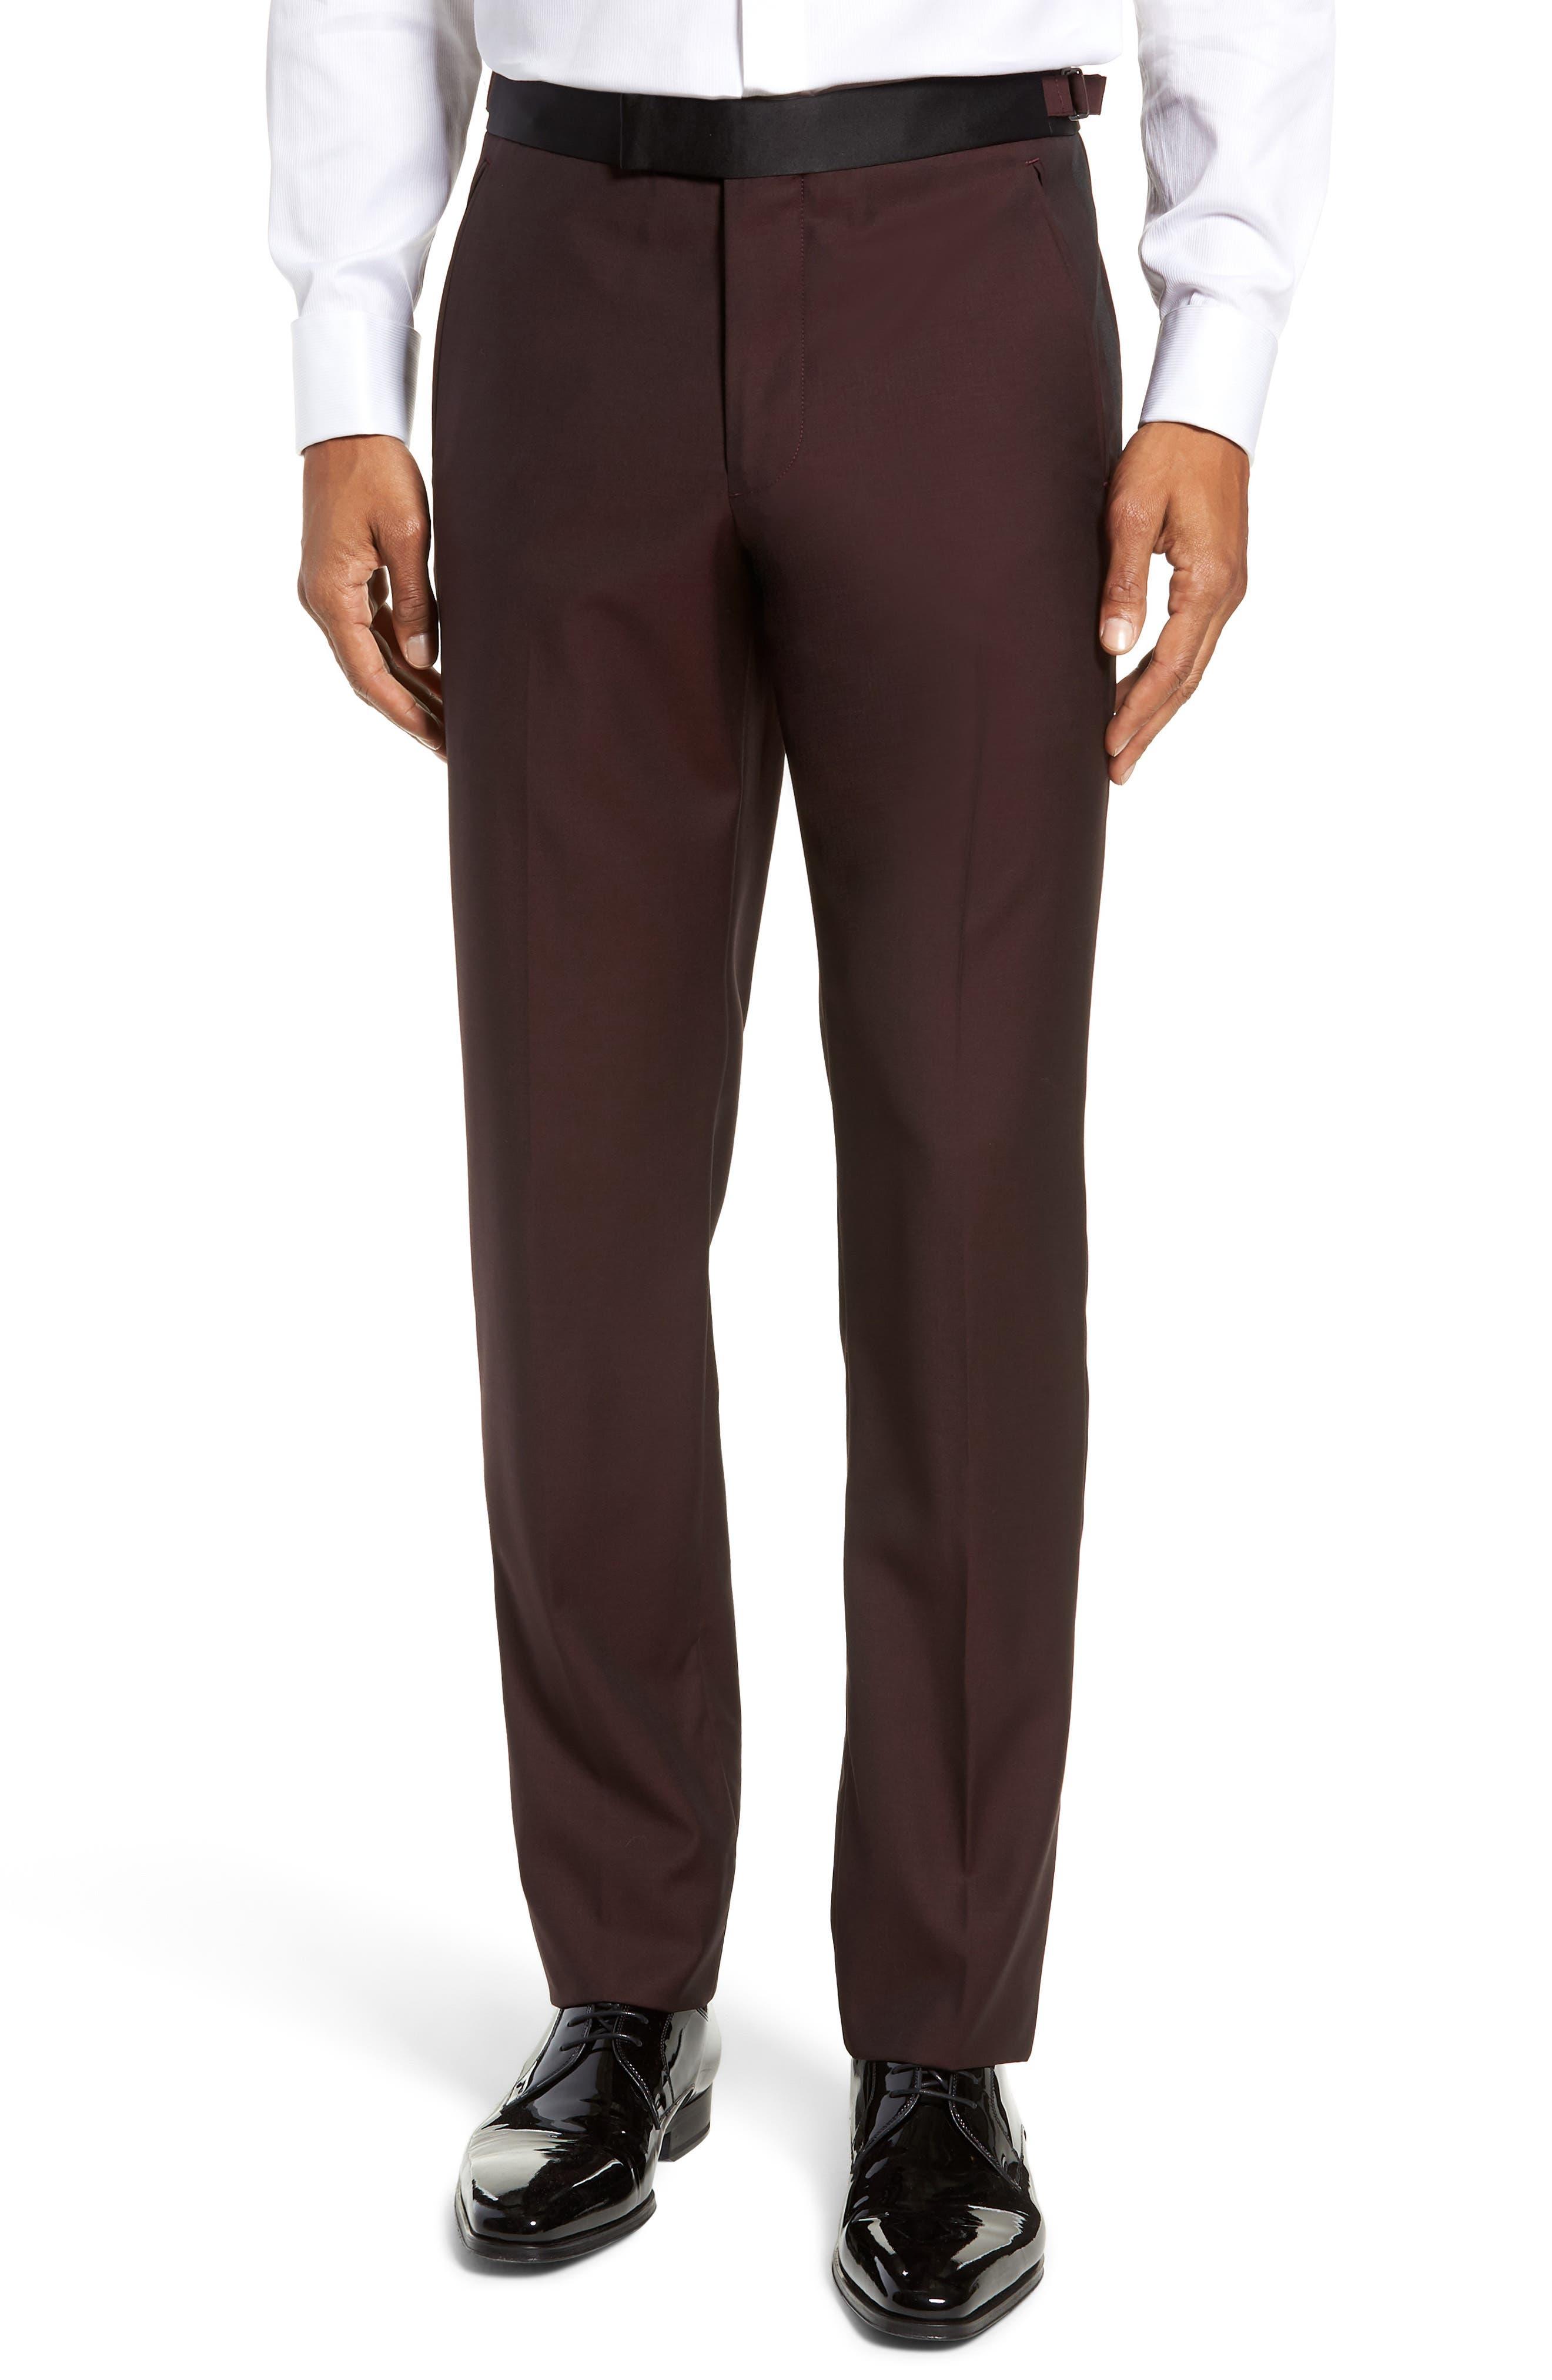 Capstone Slim Fit Tuxedo Trousers,                             Main thumbnail 1, color,                             MAROON